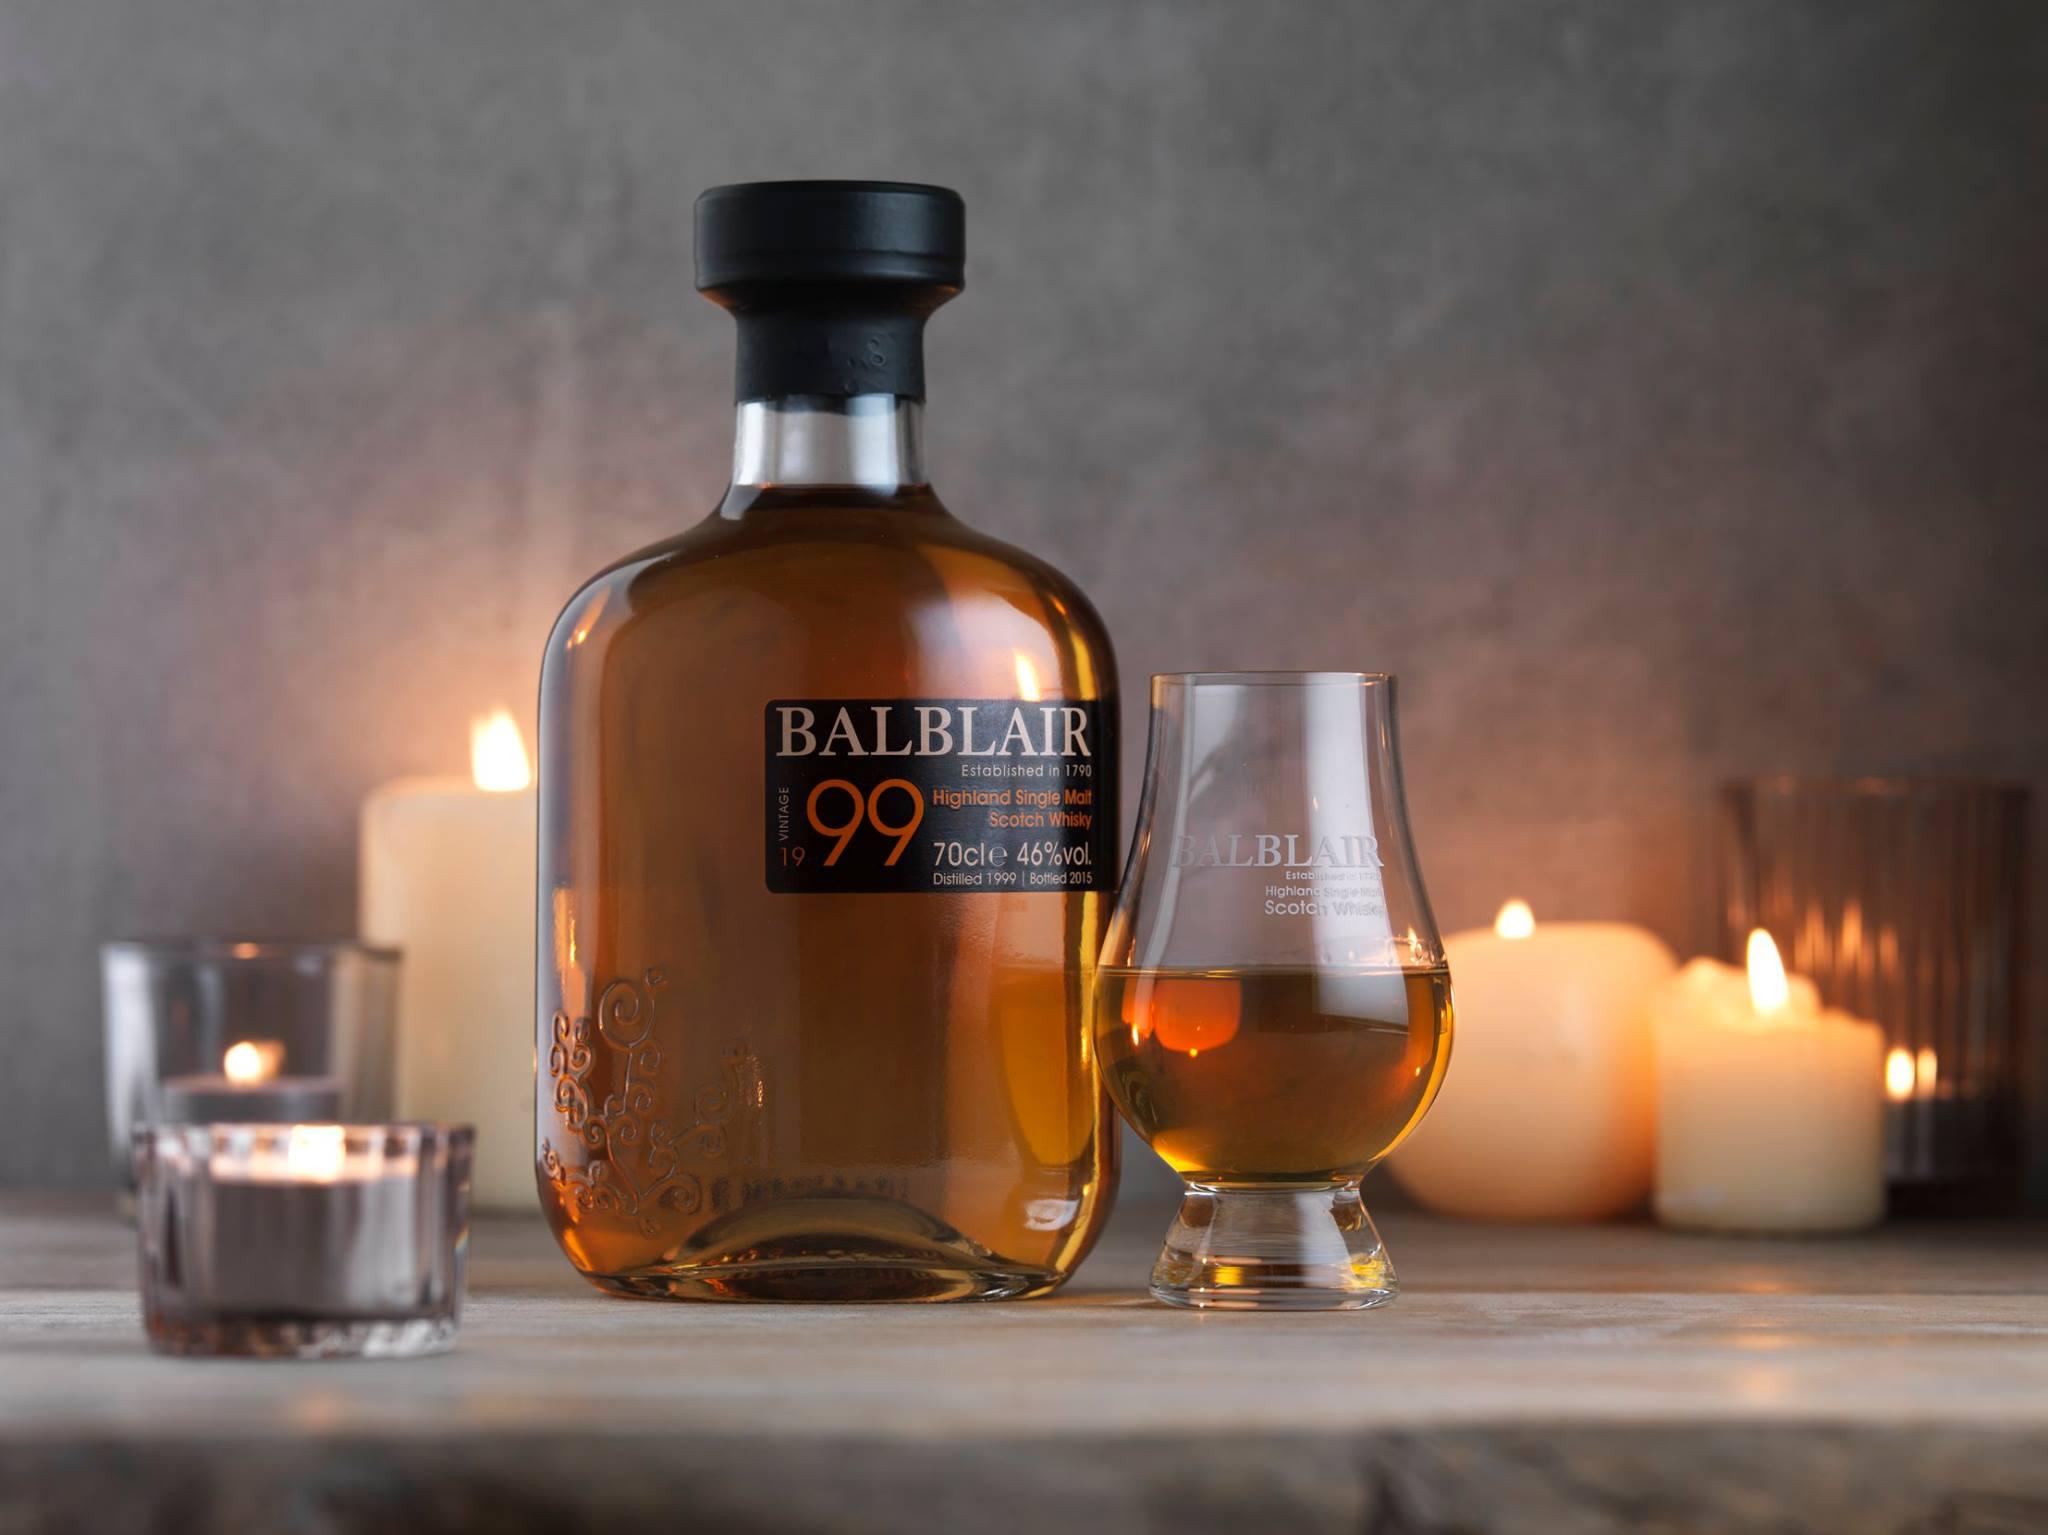 Balblair 1999 – single malt scotch